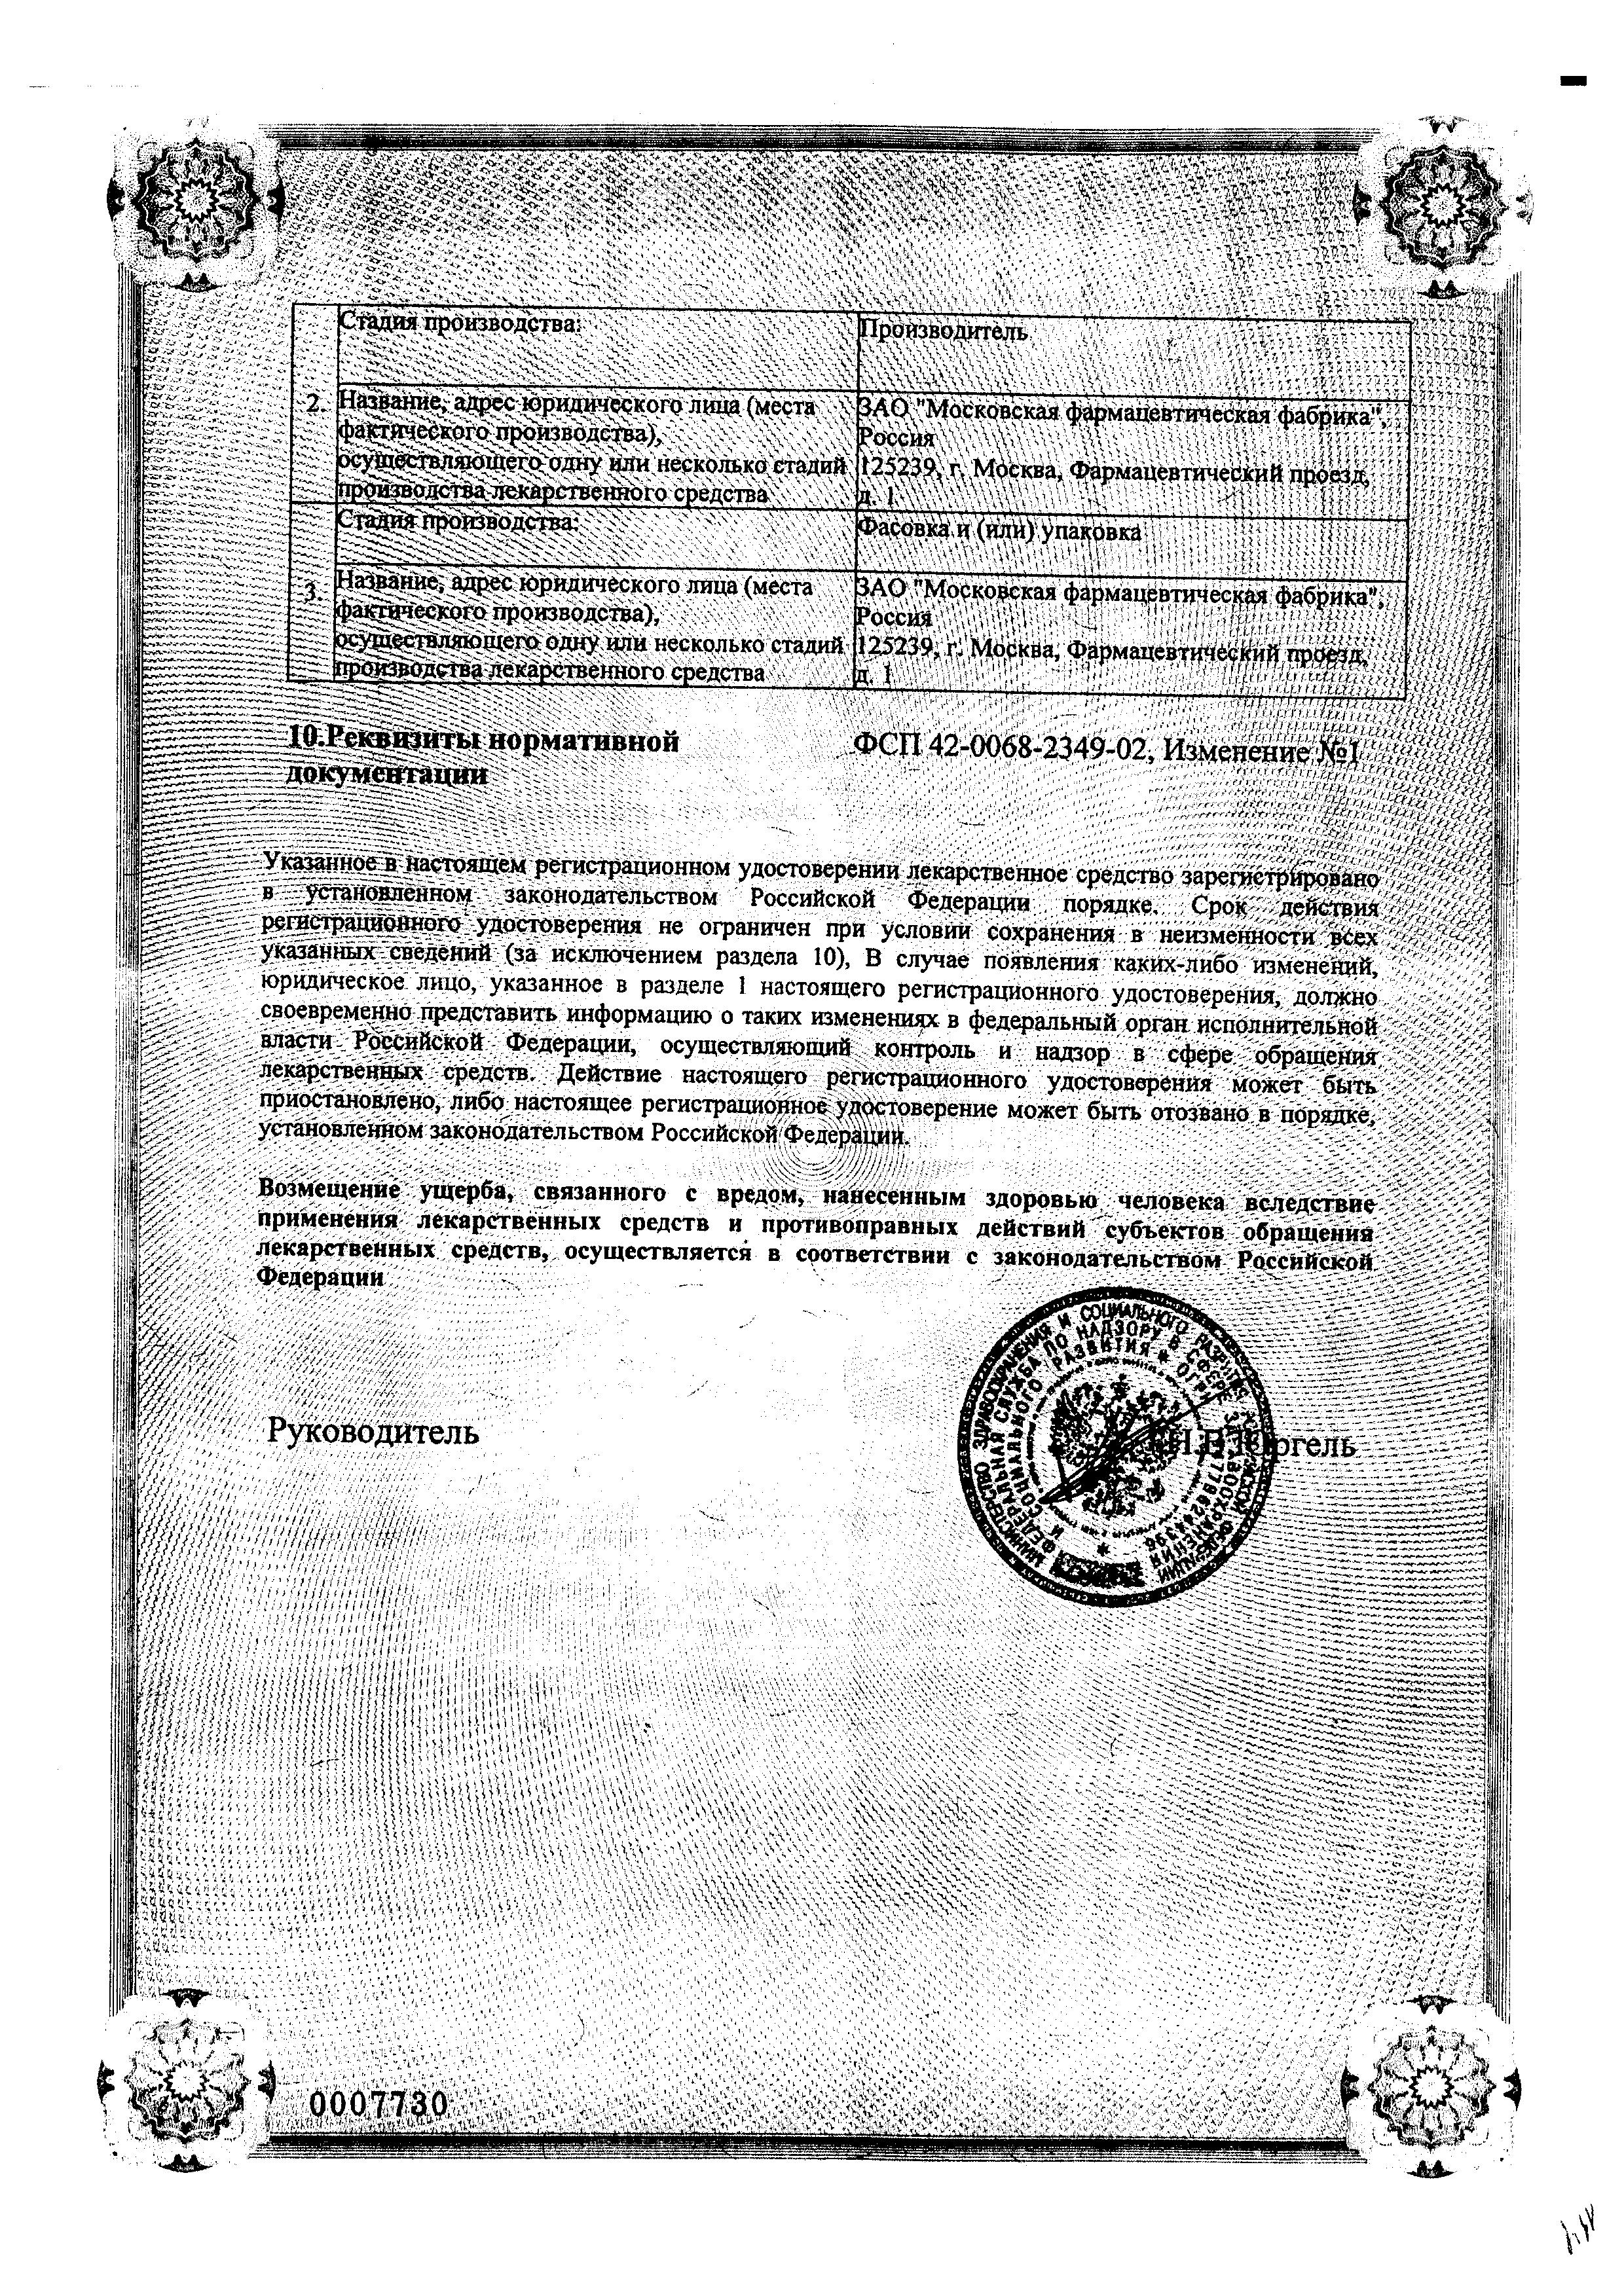 Гастрогуттал сертификат